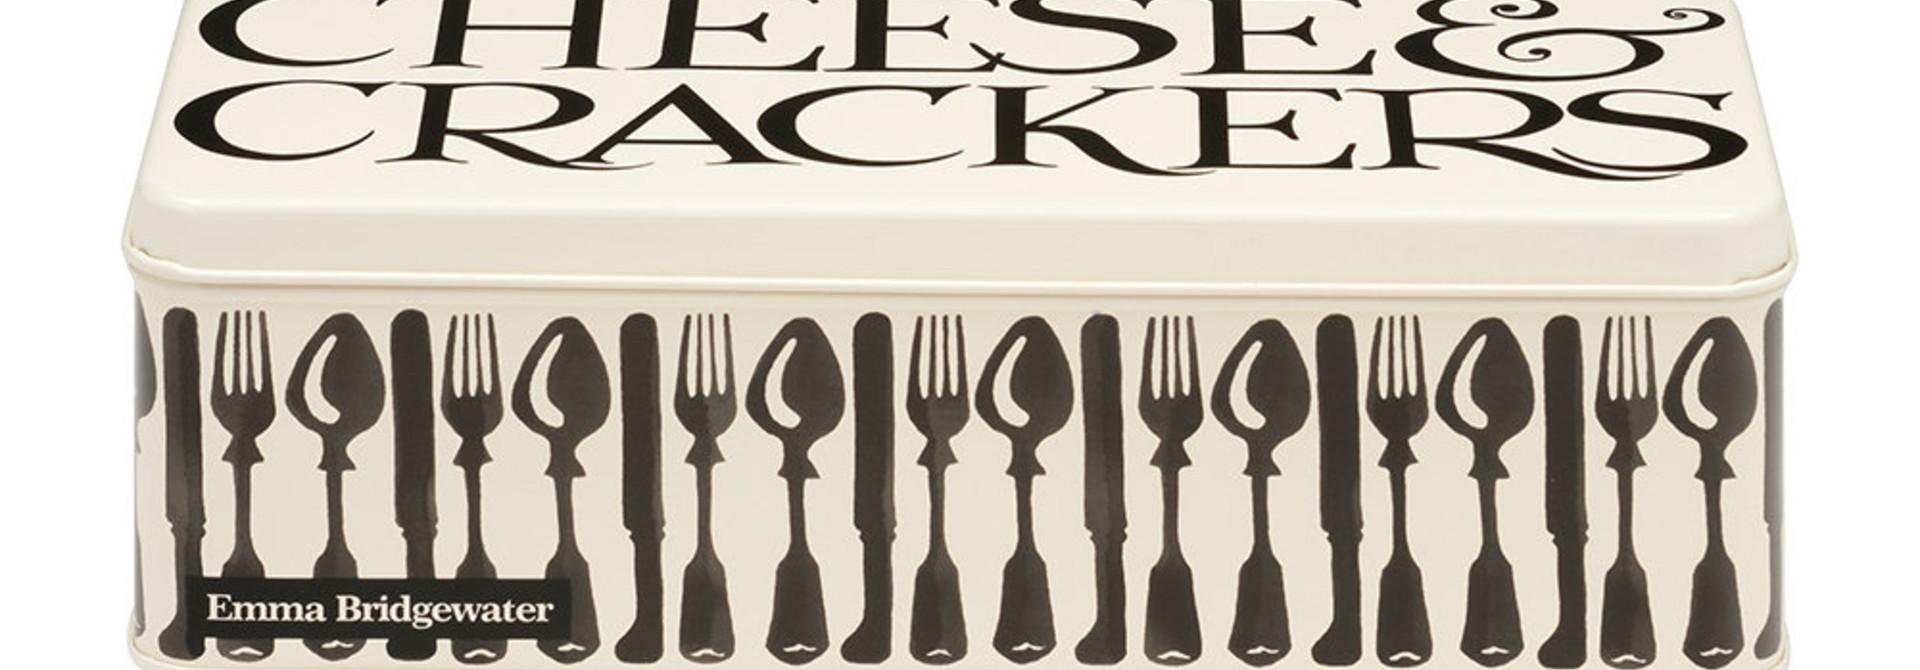 Knives & Forks - Medium Rectangular Tin